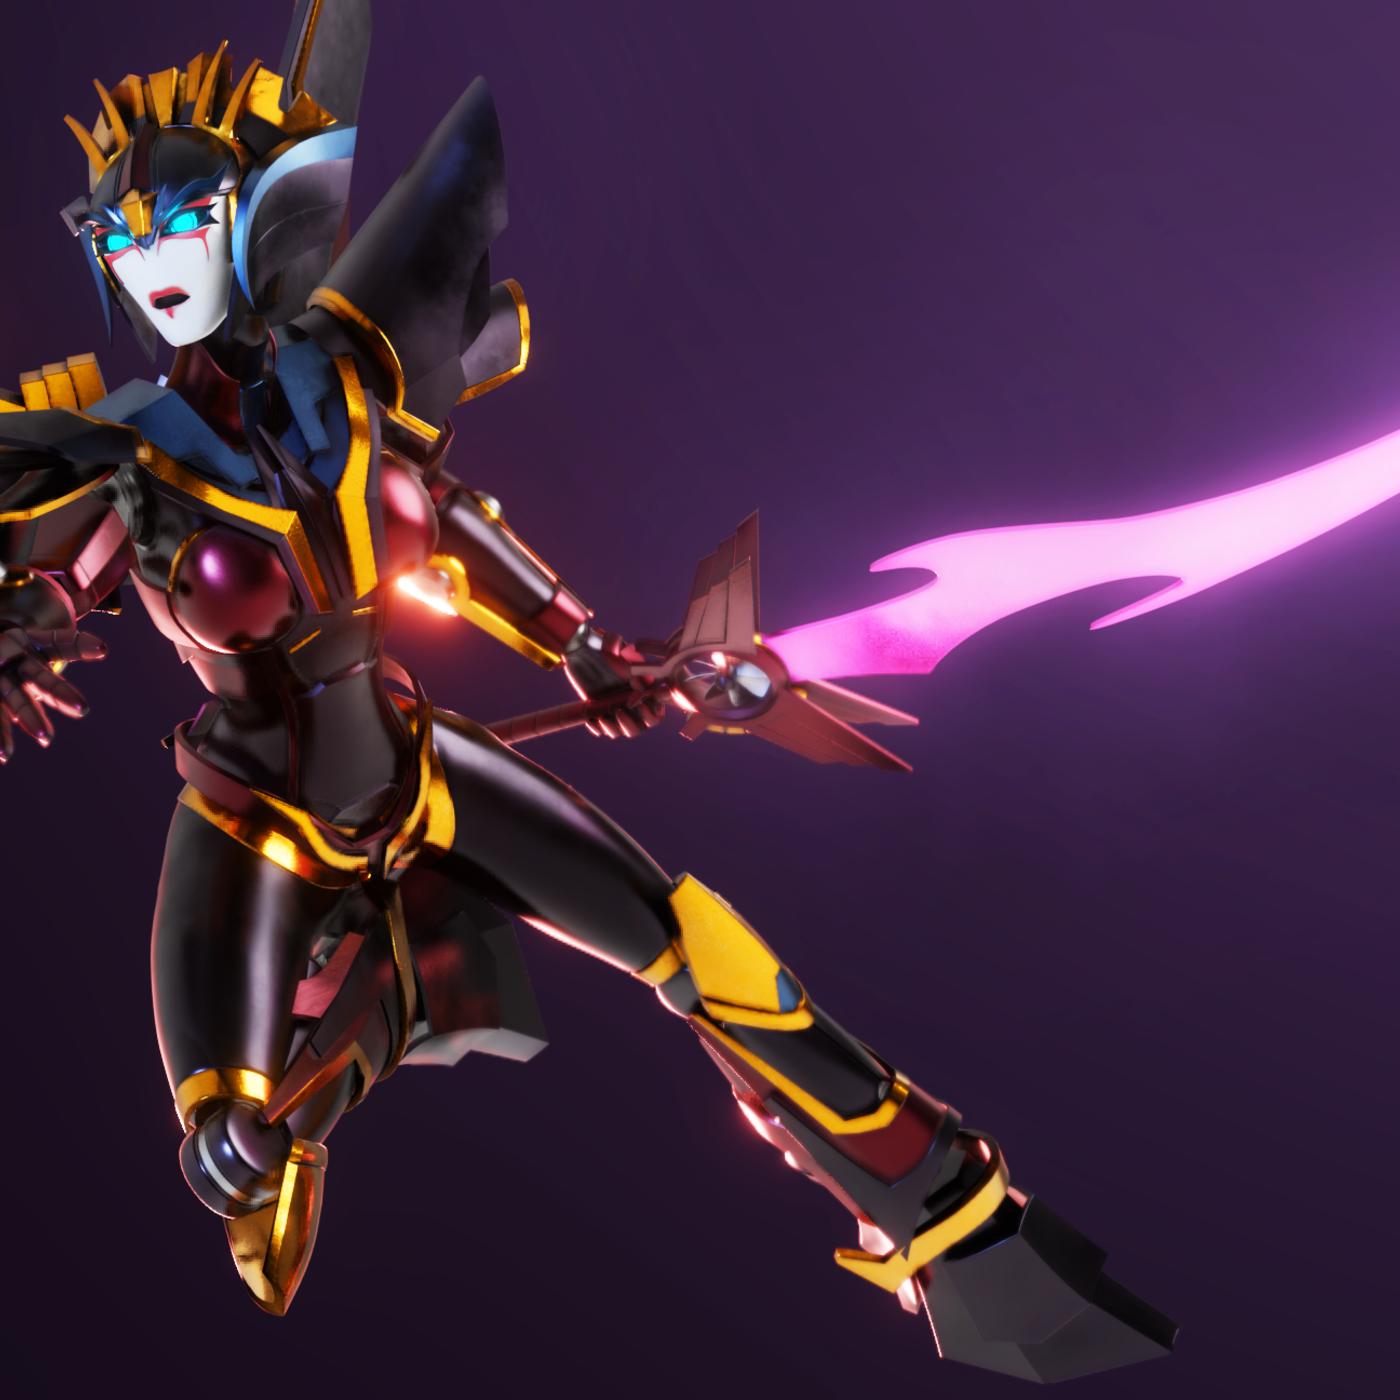 Windblade / Transformers Prime